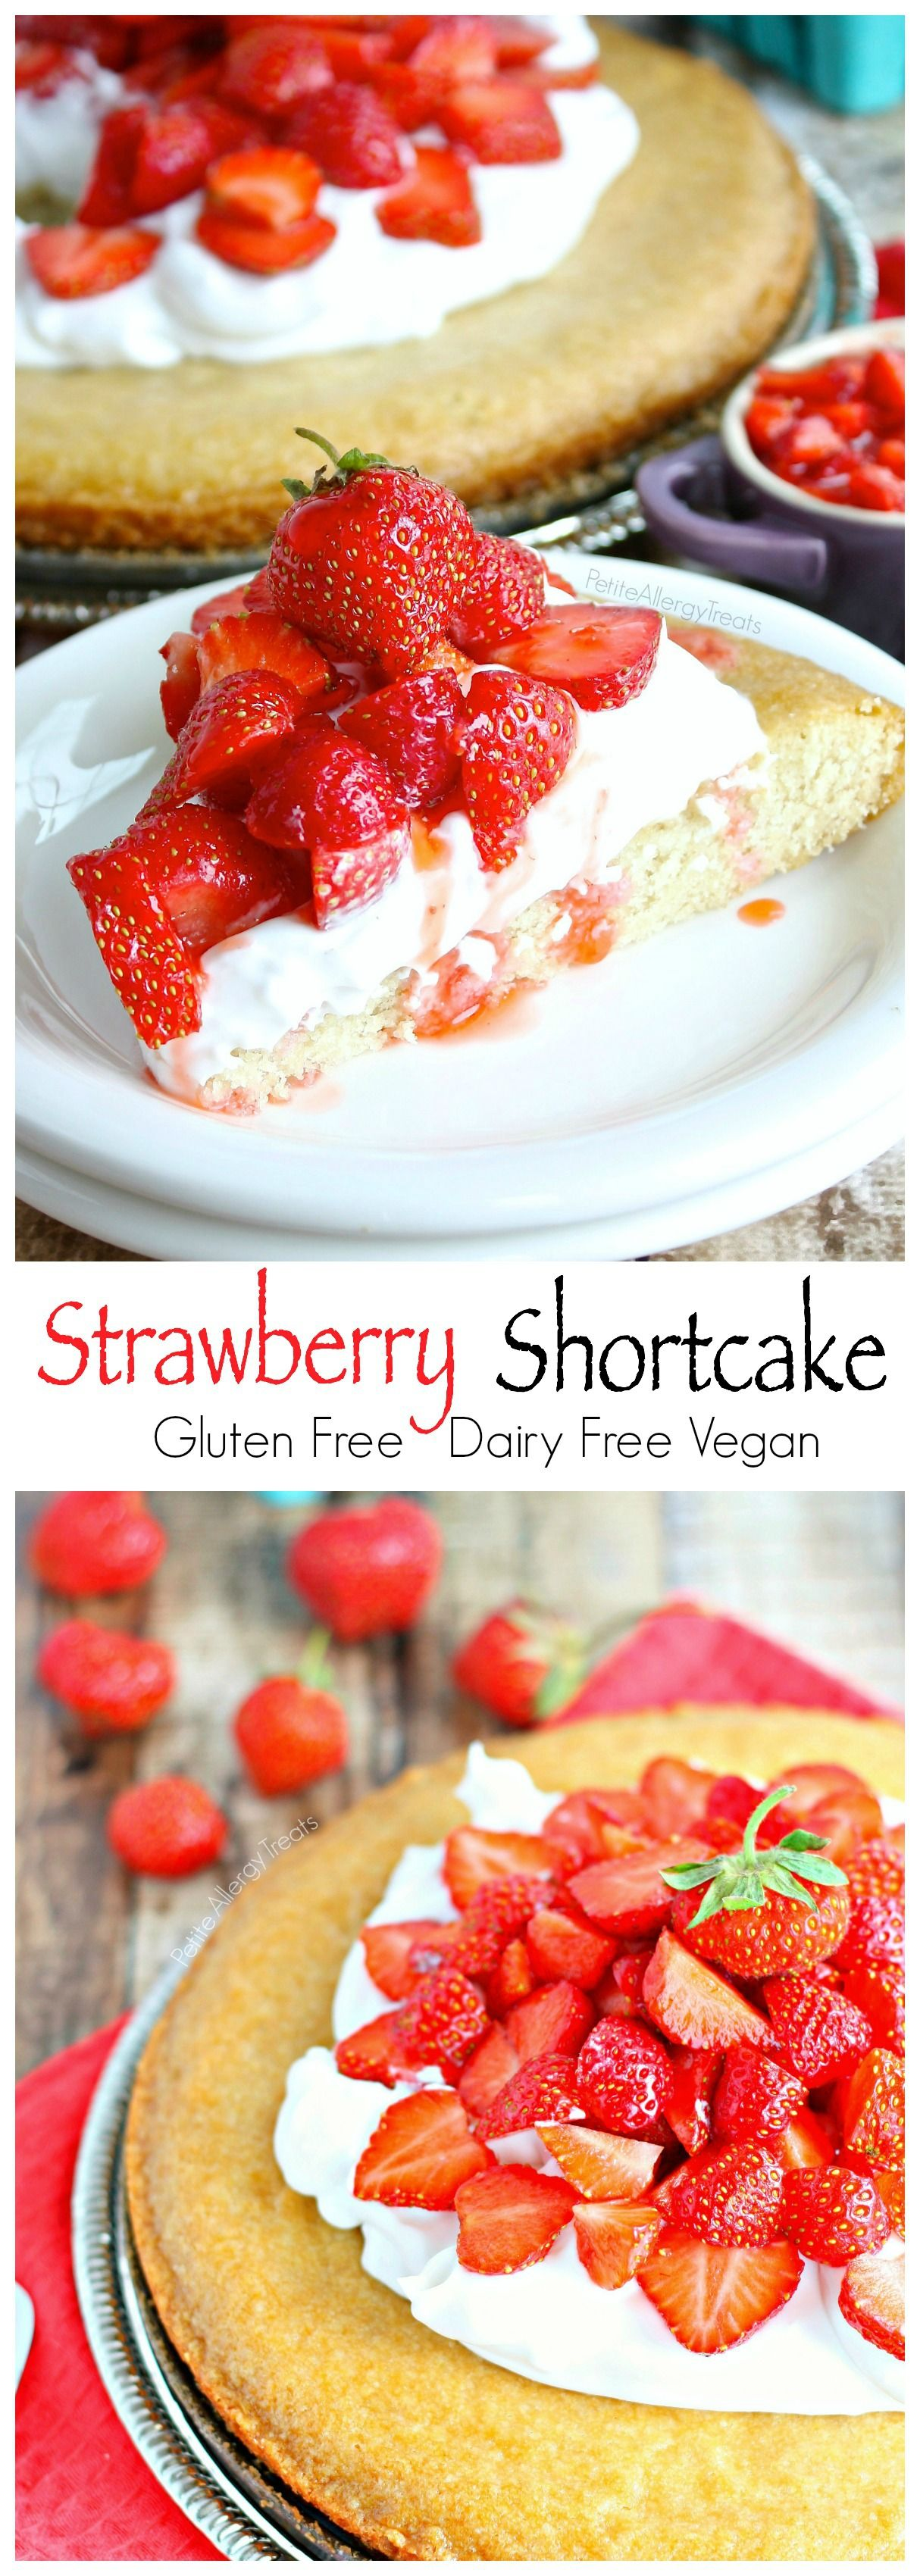 Easy Strawberry Shortcake Gluten Free Vegan Recipe Dairy